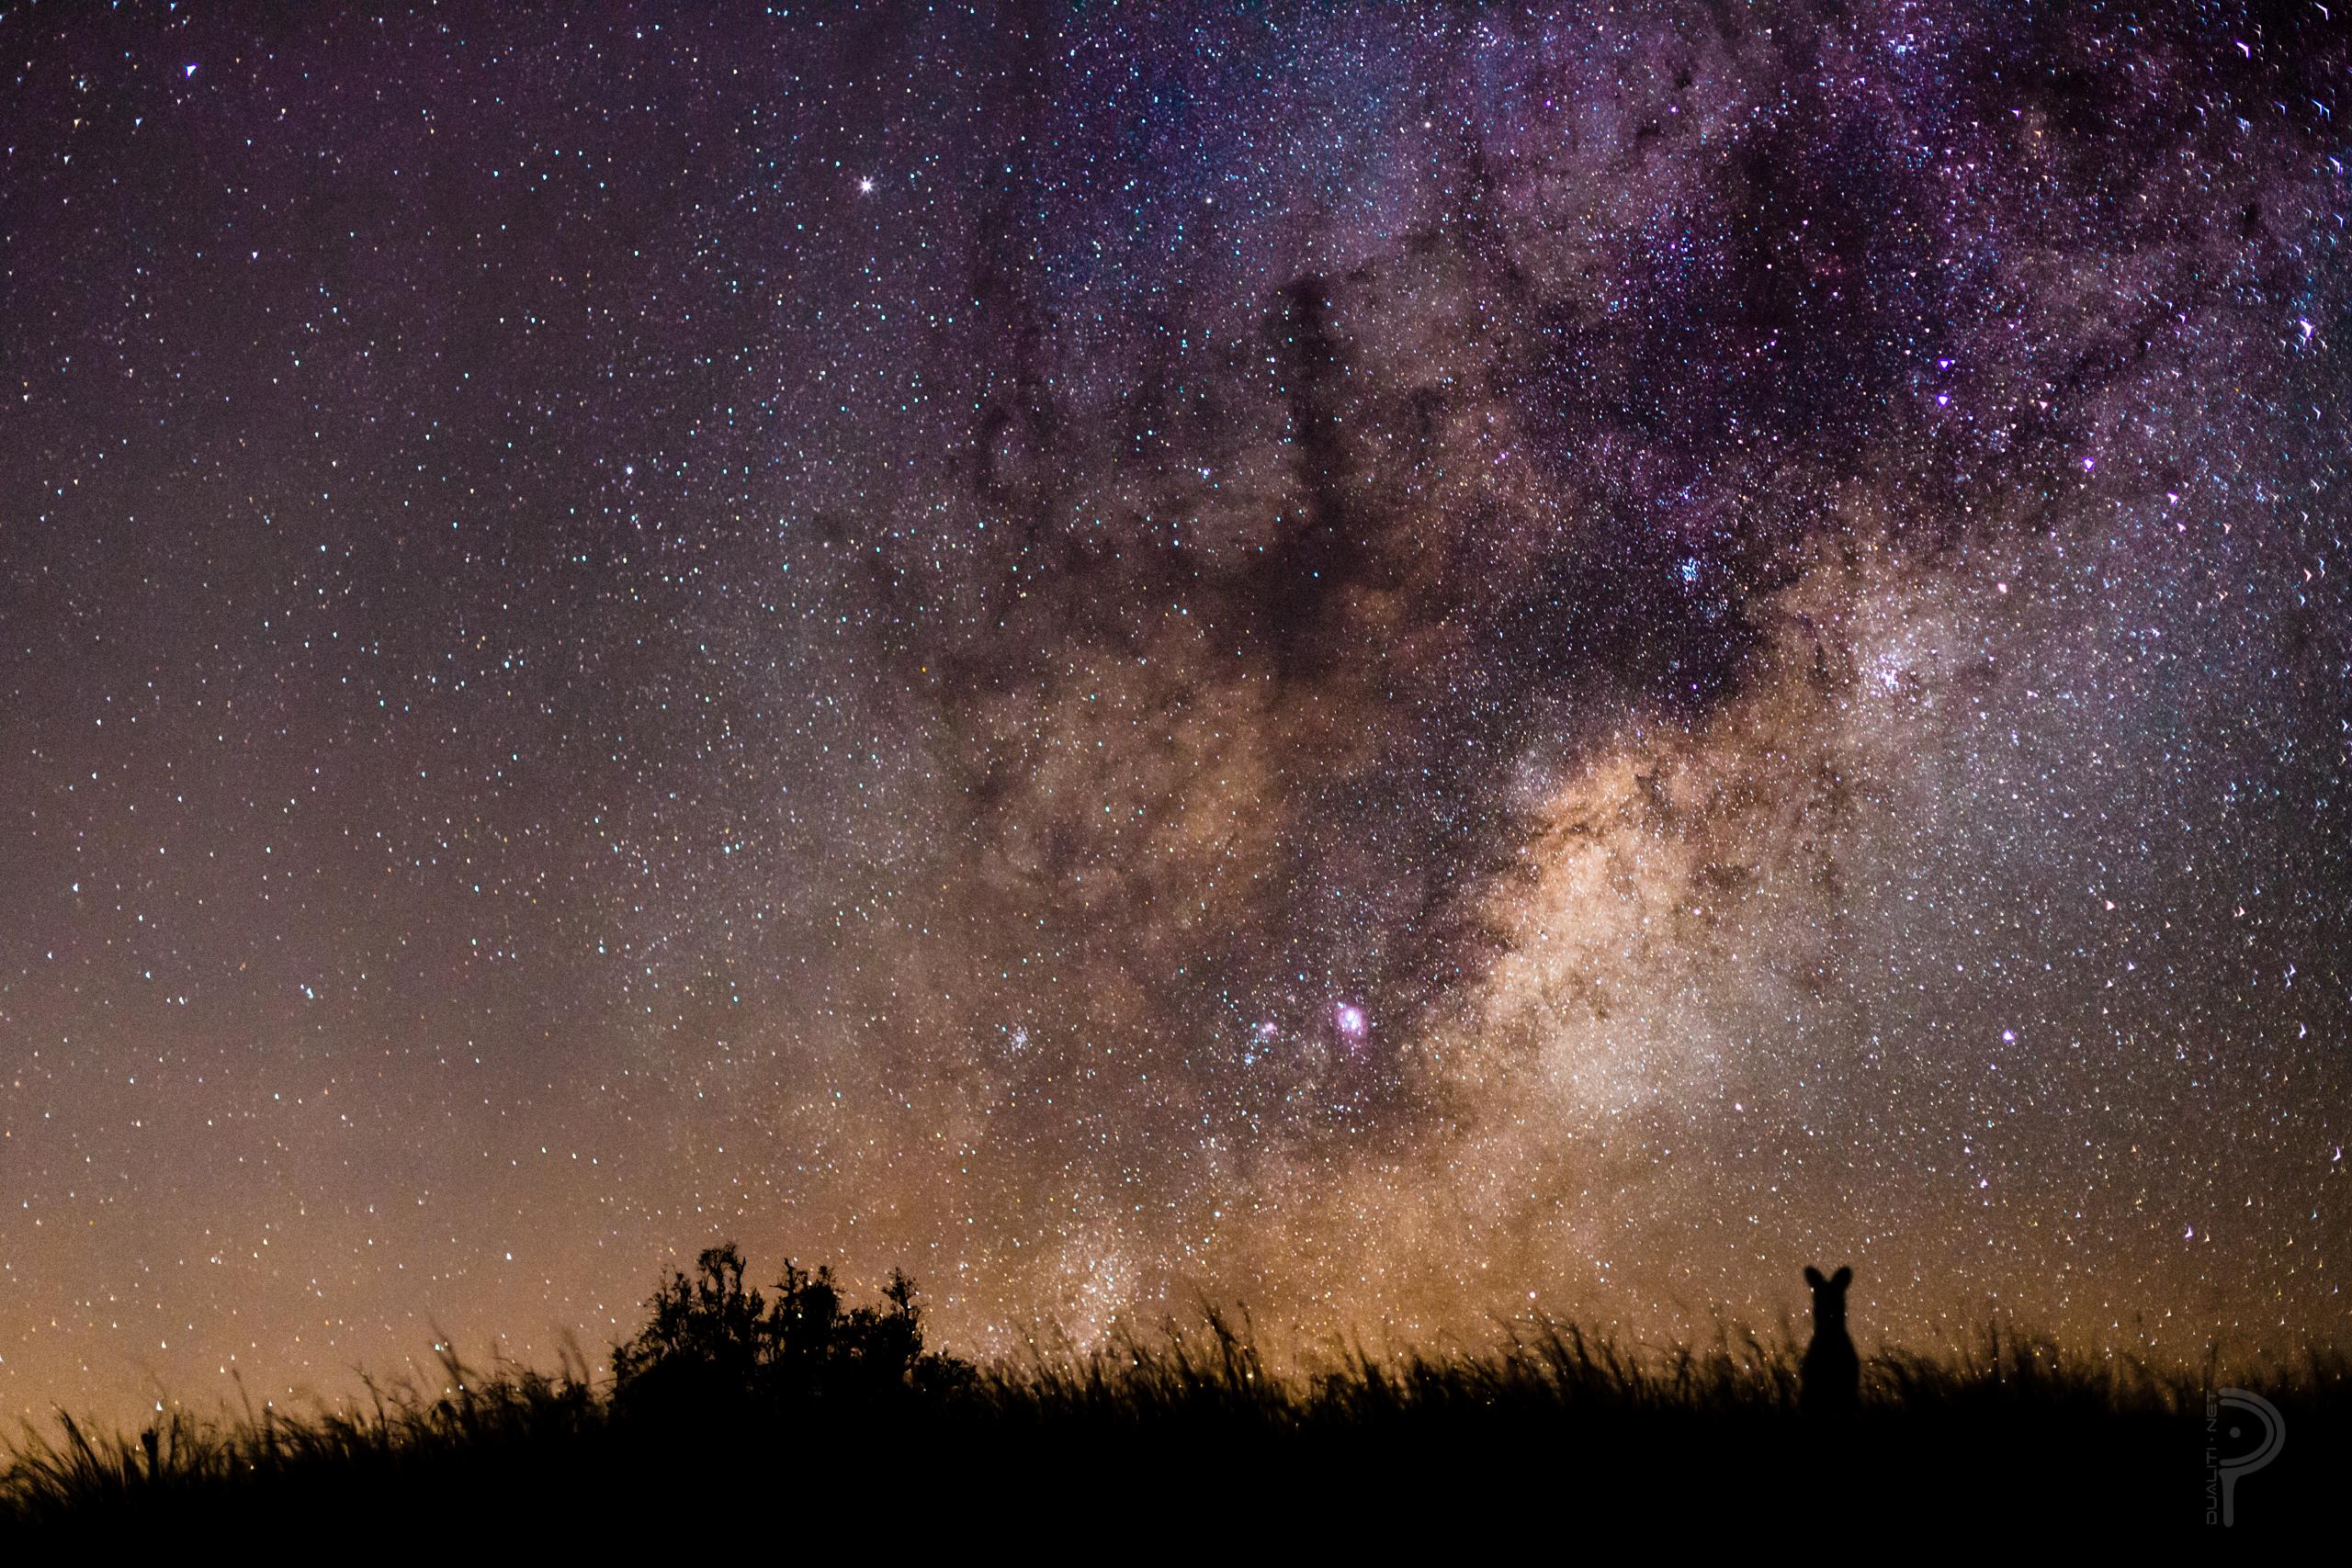 Wallpaper : night, nature, sky, photography, stars, Milky Way, nebula, Canon, atmosphere, spiral galaxy, astronomy, Australia, midnight, country, beautiful, ...